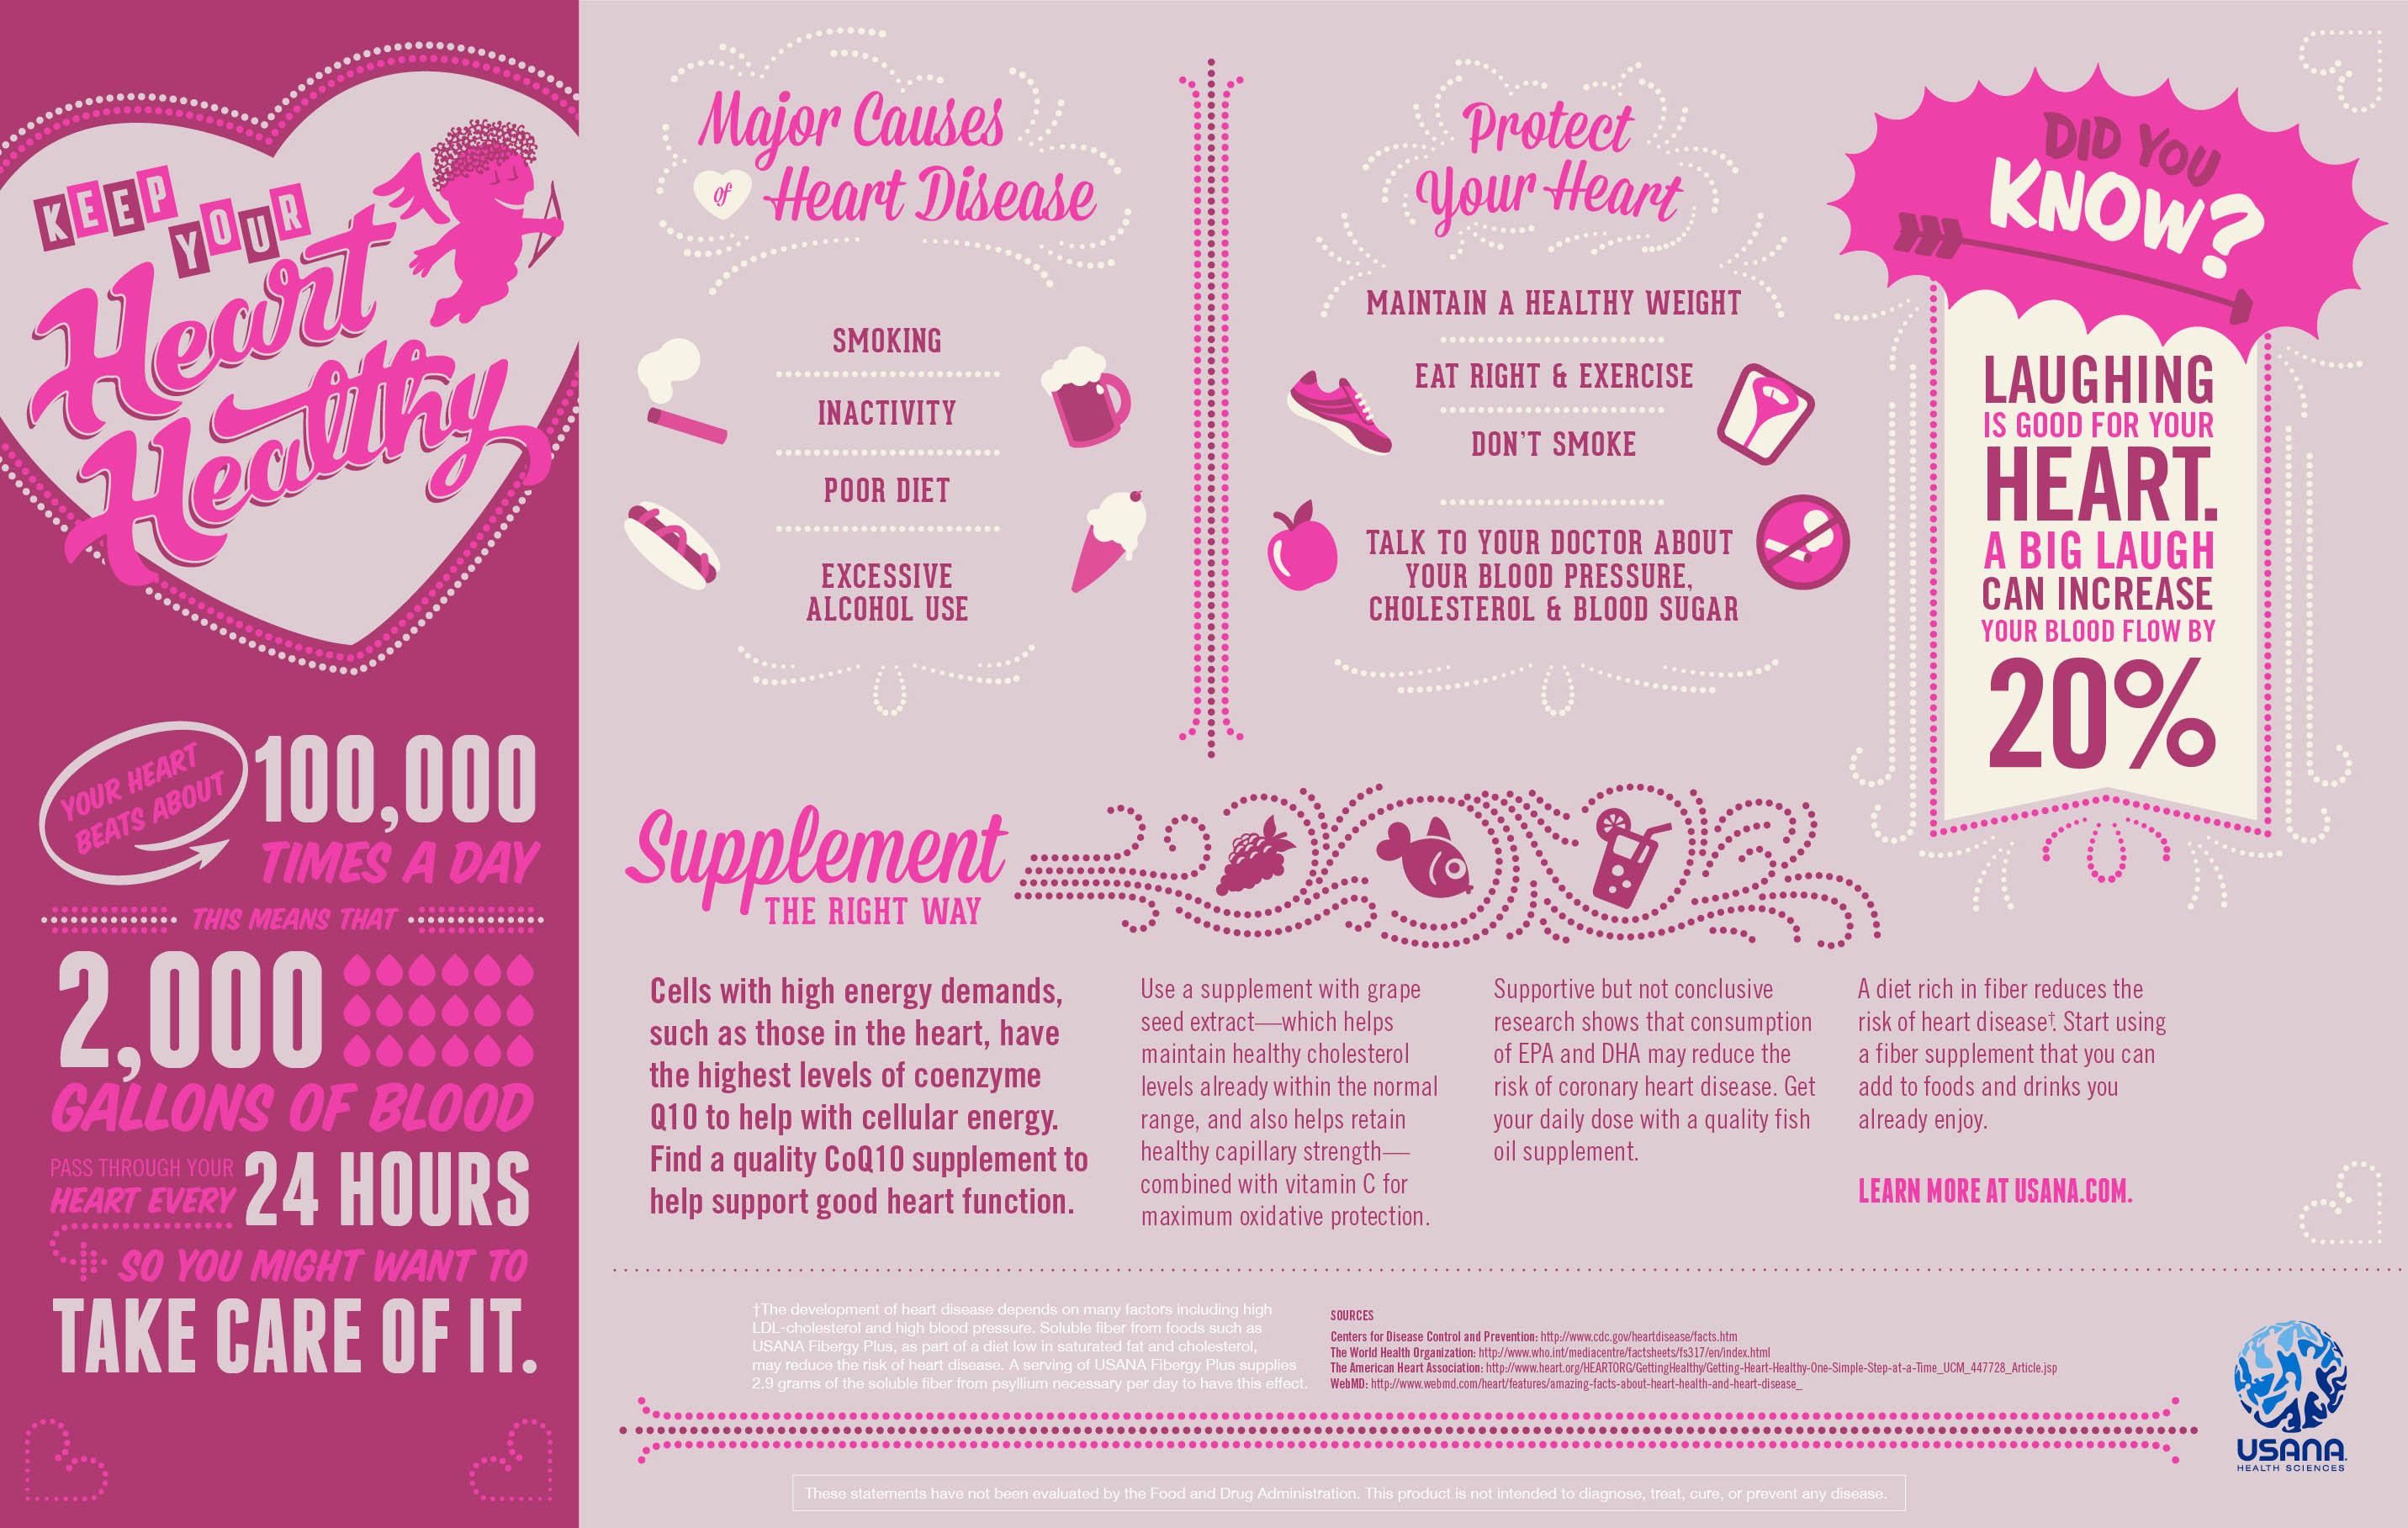 USANA Heart Health Infographic